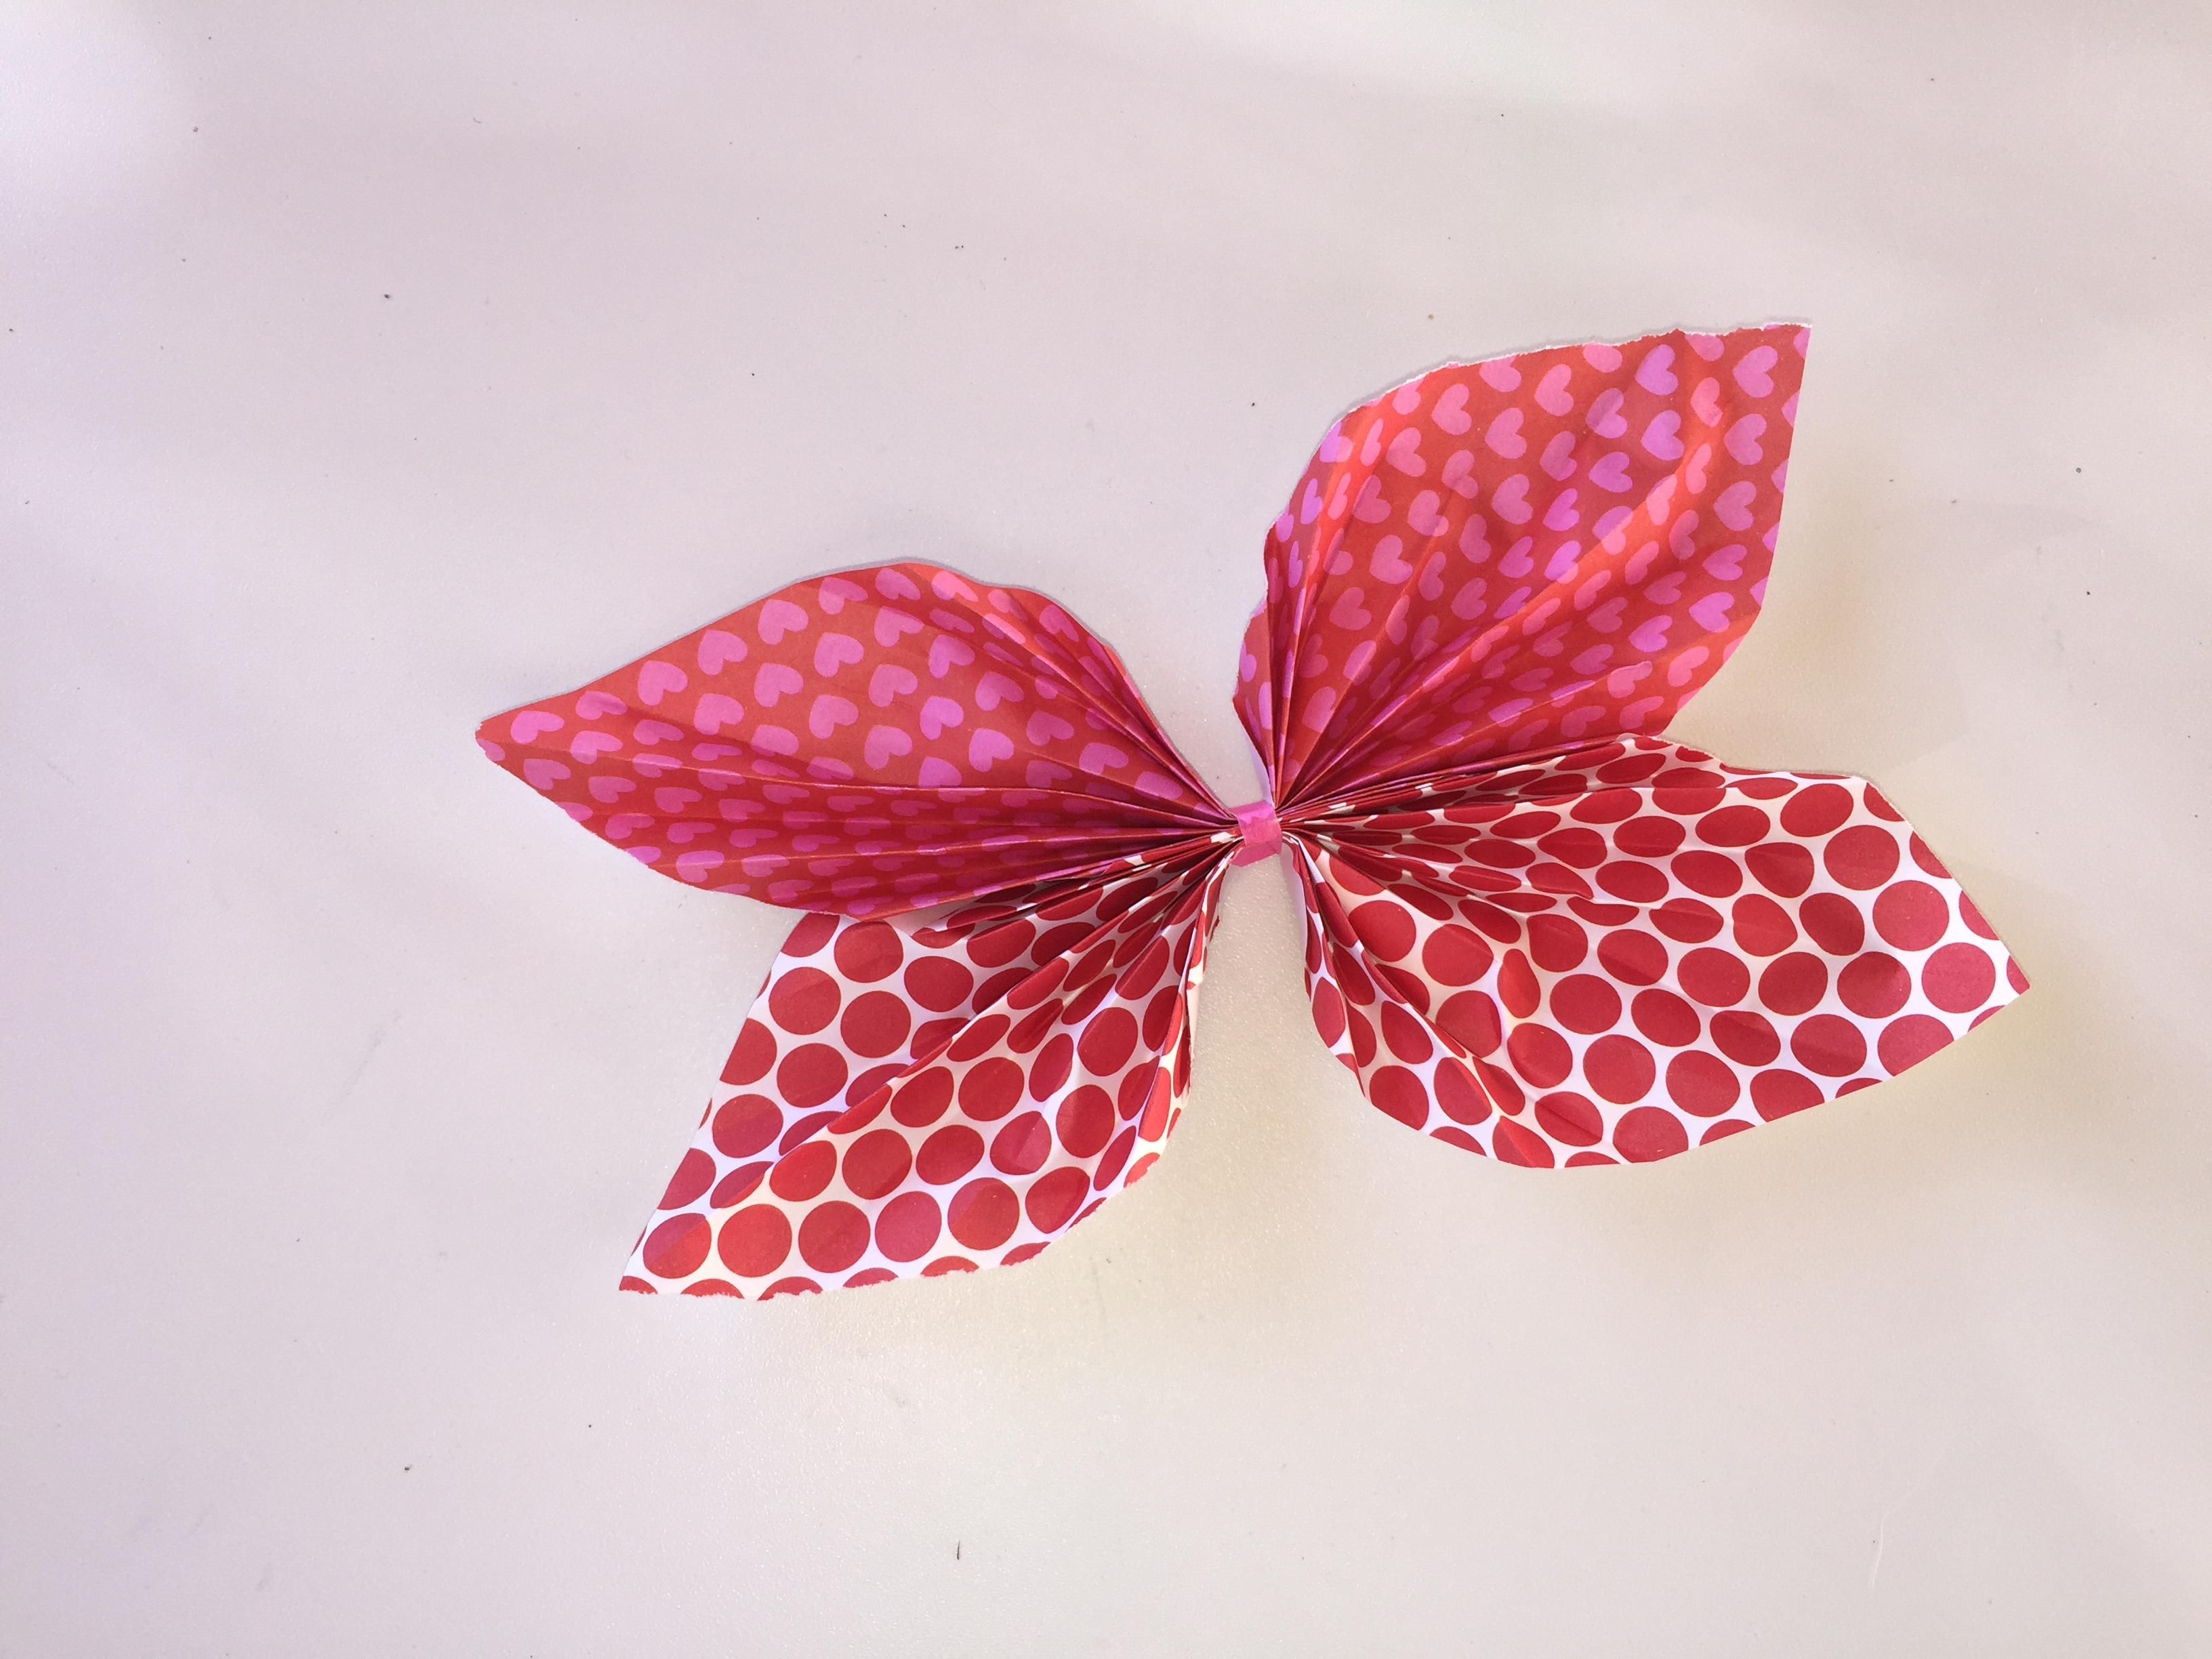 Mariposas de papel para decorar mariposas de papel uc - Mariposas para pared ...